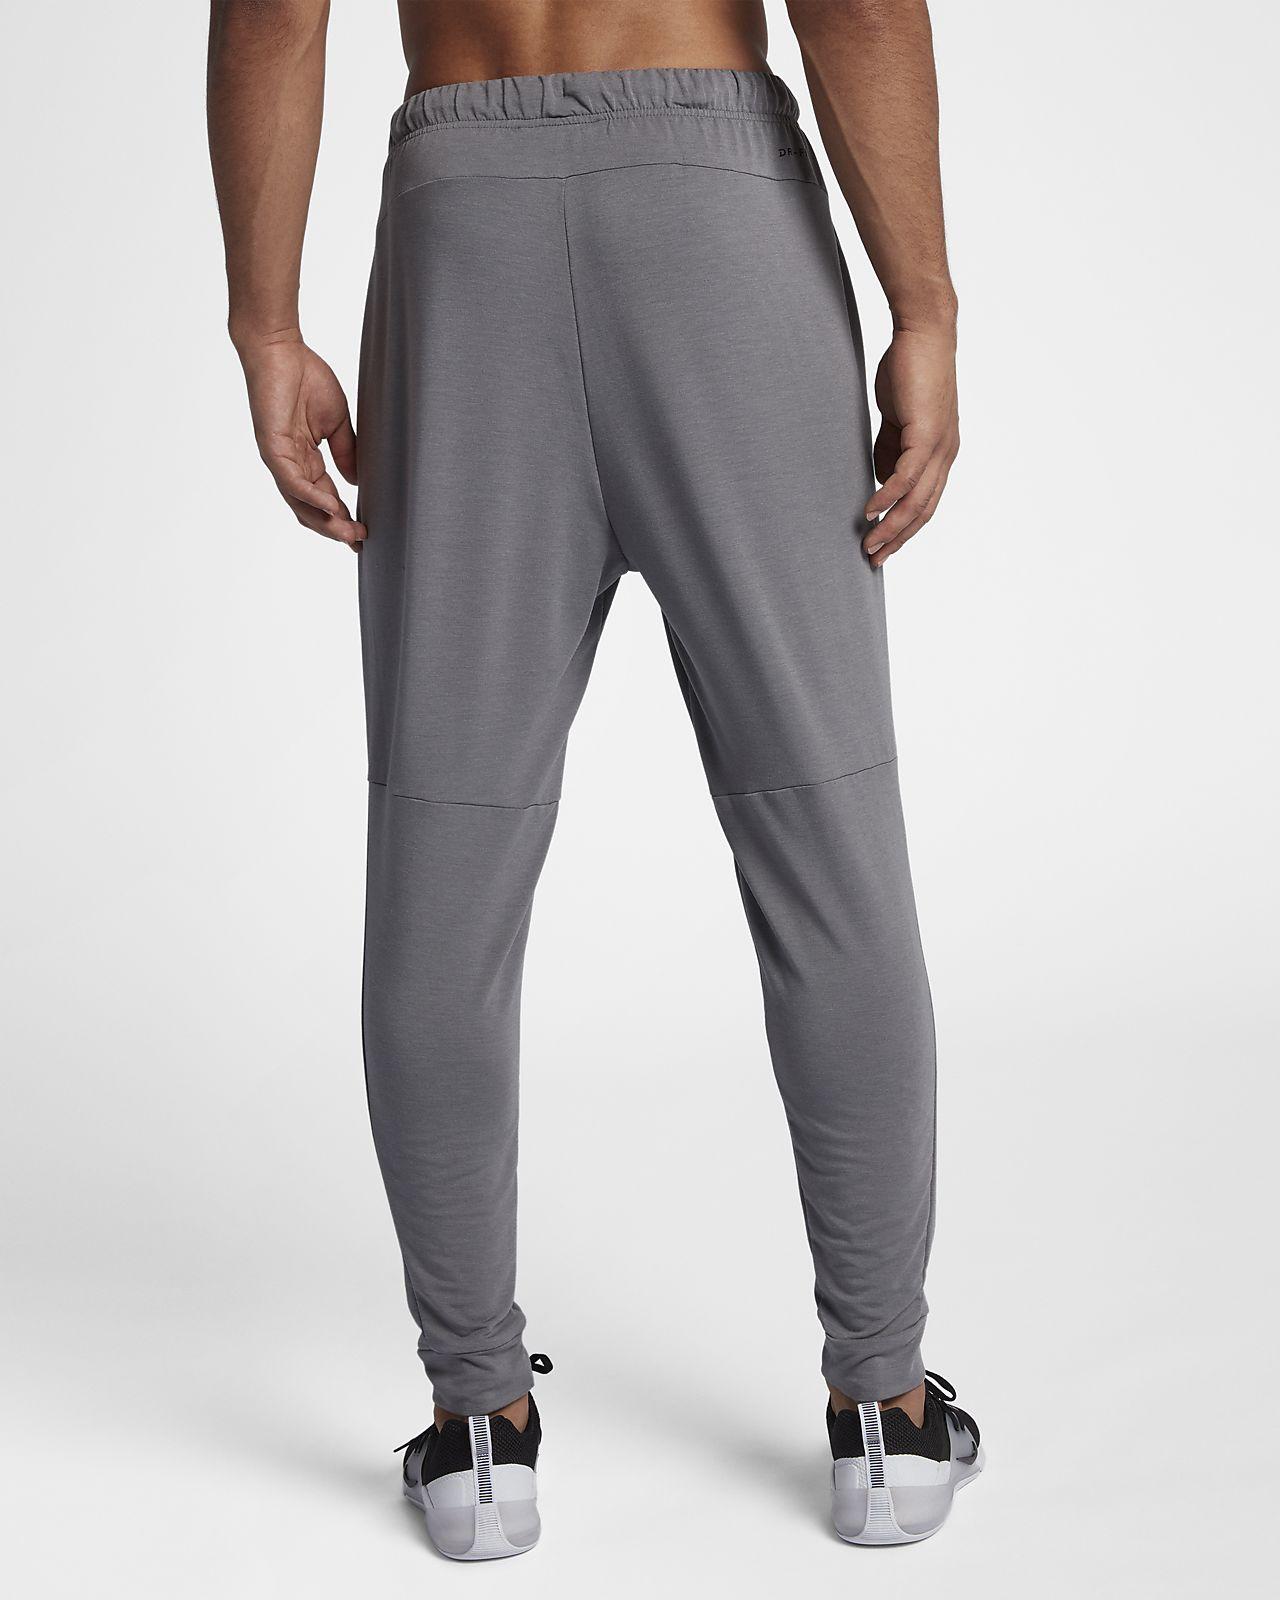 fabf5b22ef28 Nike Dri-FIT Men s Training Trousers. Nike.com MA